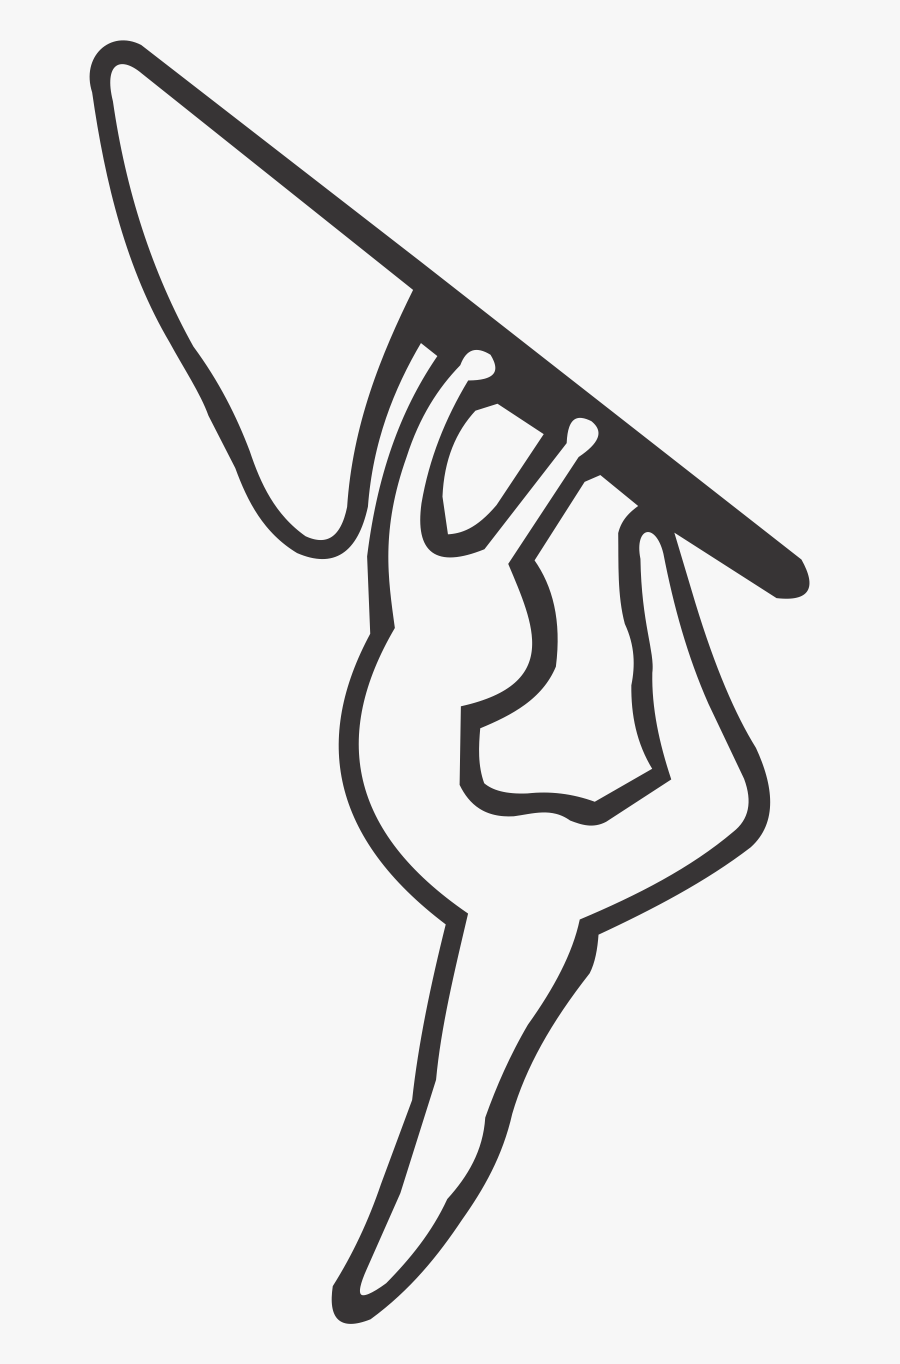 Color Guard Clip Art Colour Guard Image Portable Network - Draw A Color Guard Flag, Transparent Clipart